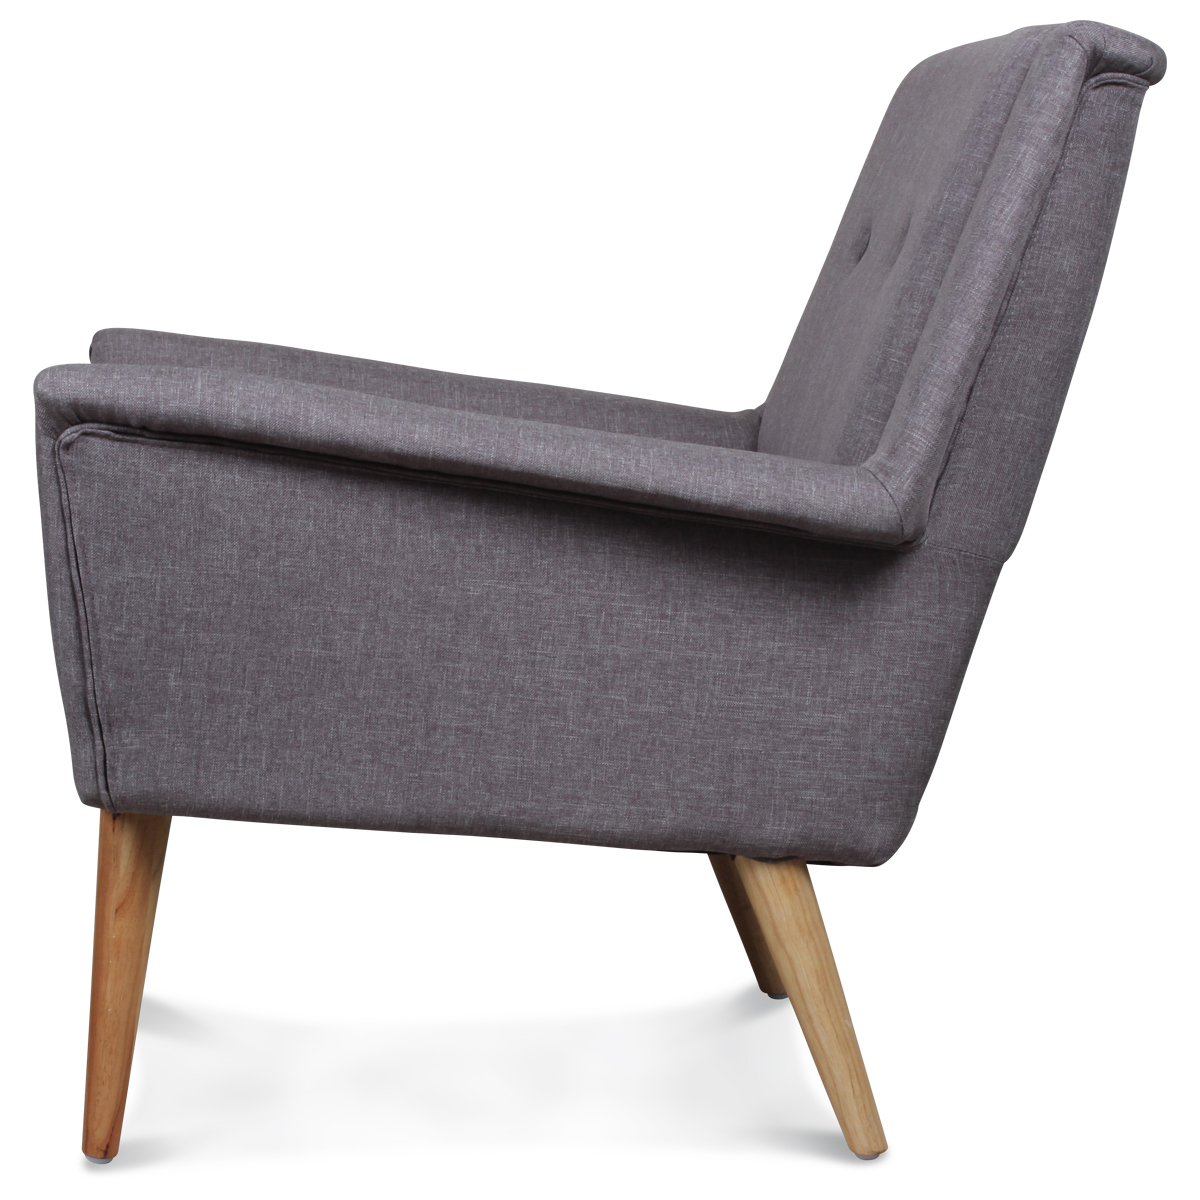 Fauteuil Design Scandinave Moderne Gris Souris Fitz Demeure Et Jardin